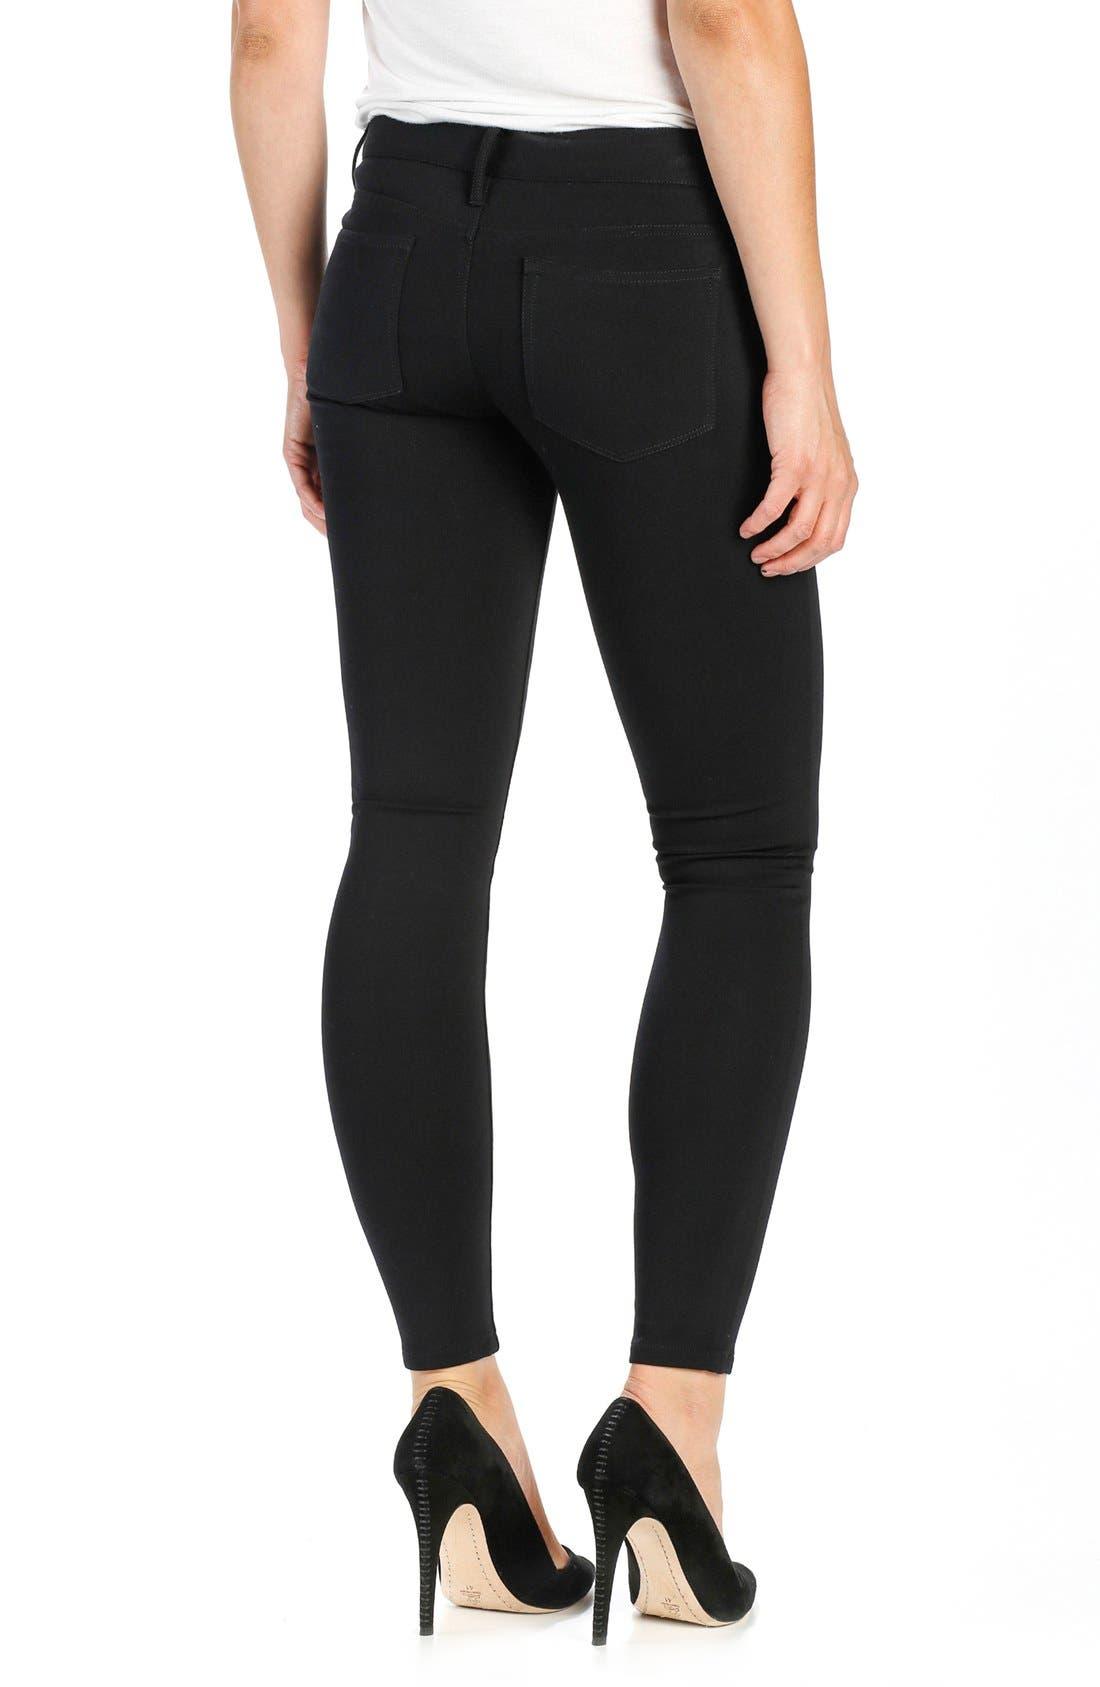 'Verdugo' Ponte Ankle Pants,                             Alternate thumbnail 2, color,                             BLACK